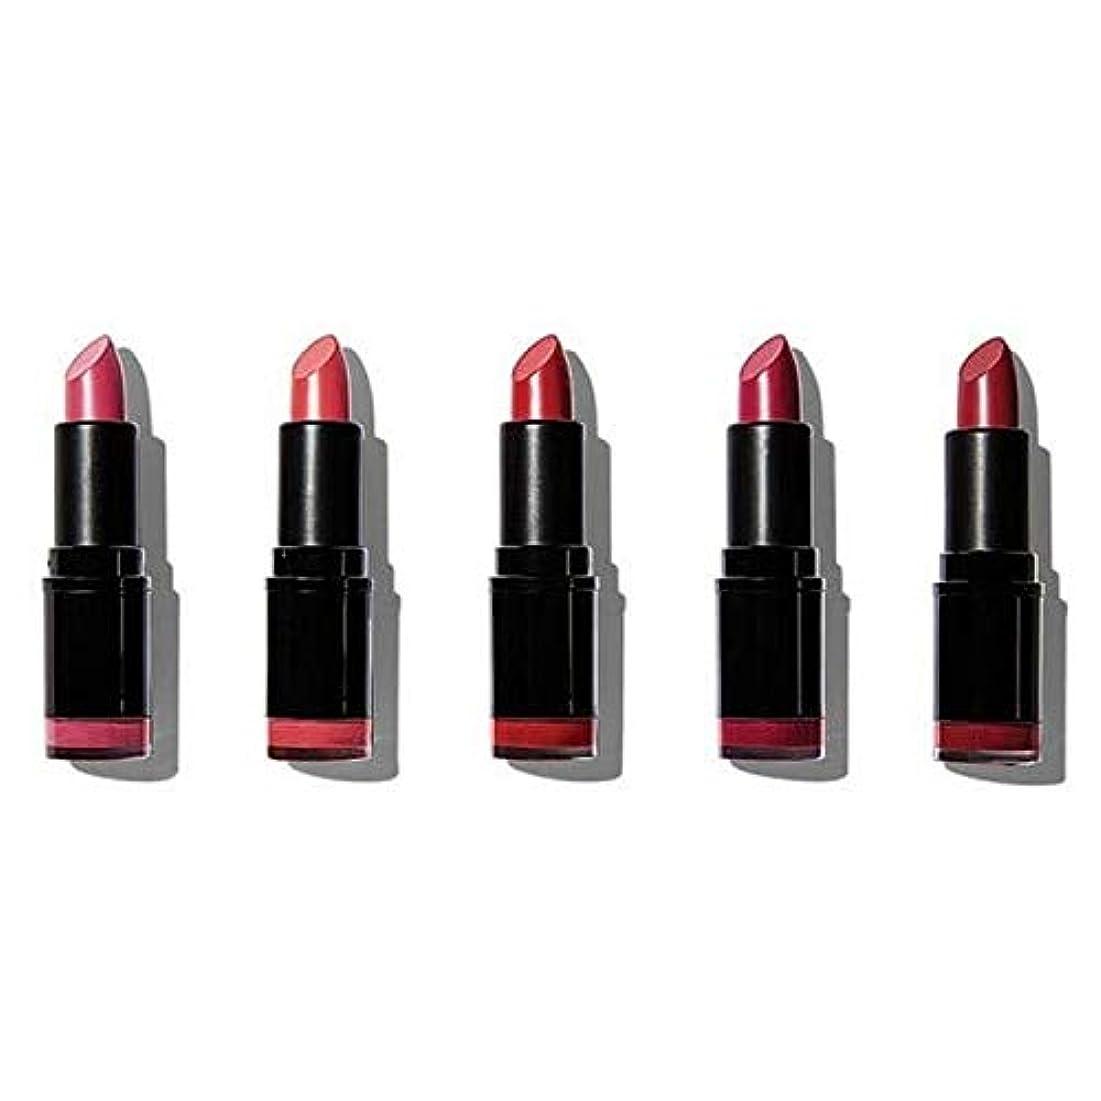 [Revolution ] 革命プロ口紅のコレクションマット赤 - Revolution Pro Lipstick Collection Matte Reds [並行輸入品]